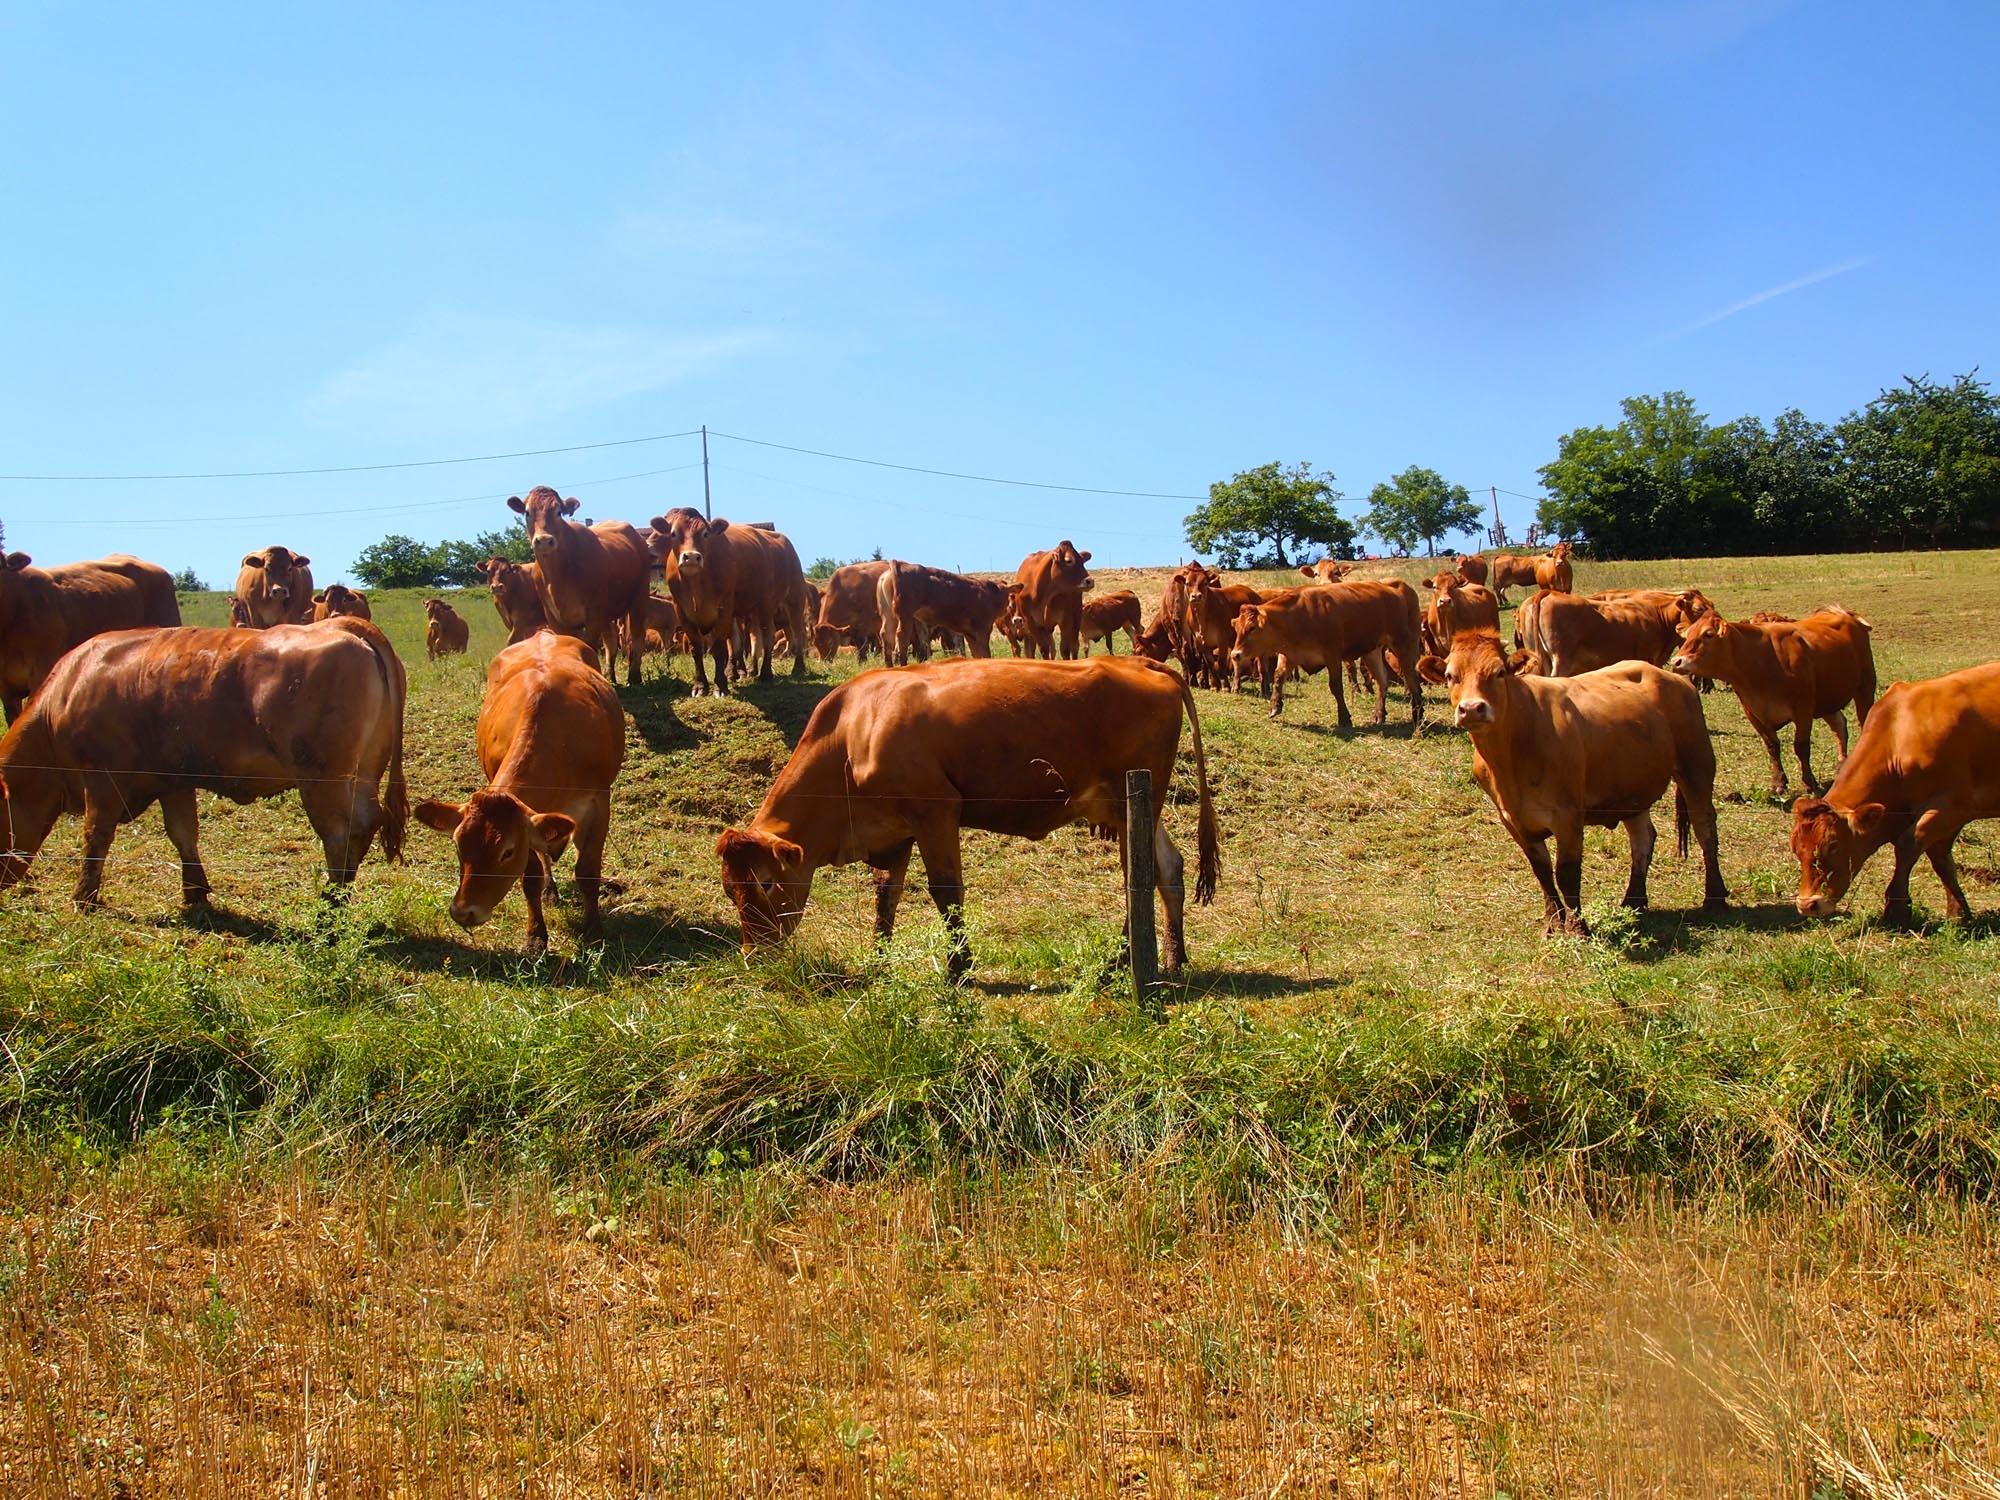 Ferme-de-Peyrot-vente-directe-de-viande-bovine-limousine-montgazin-en-haute-garonne-troupeau